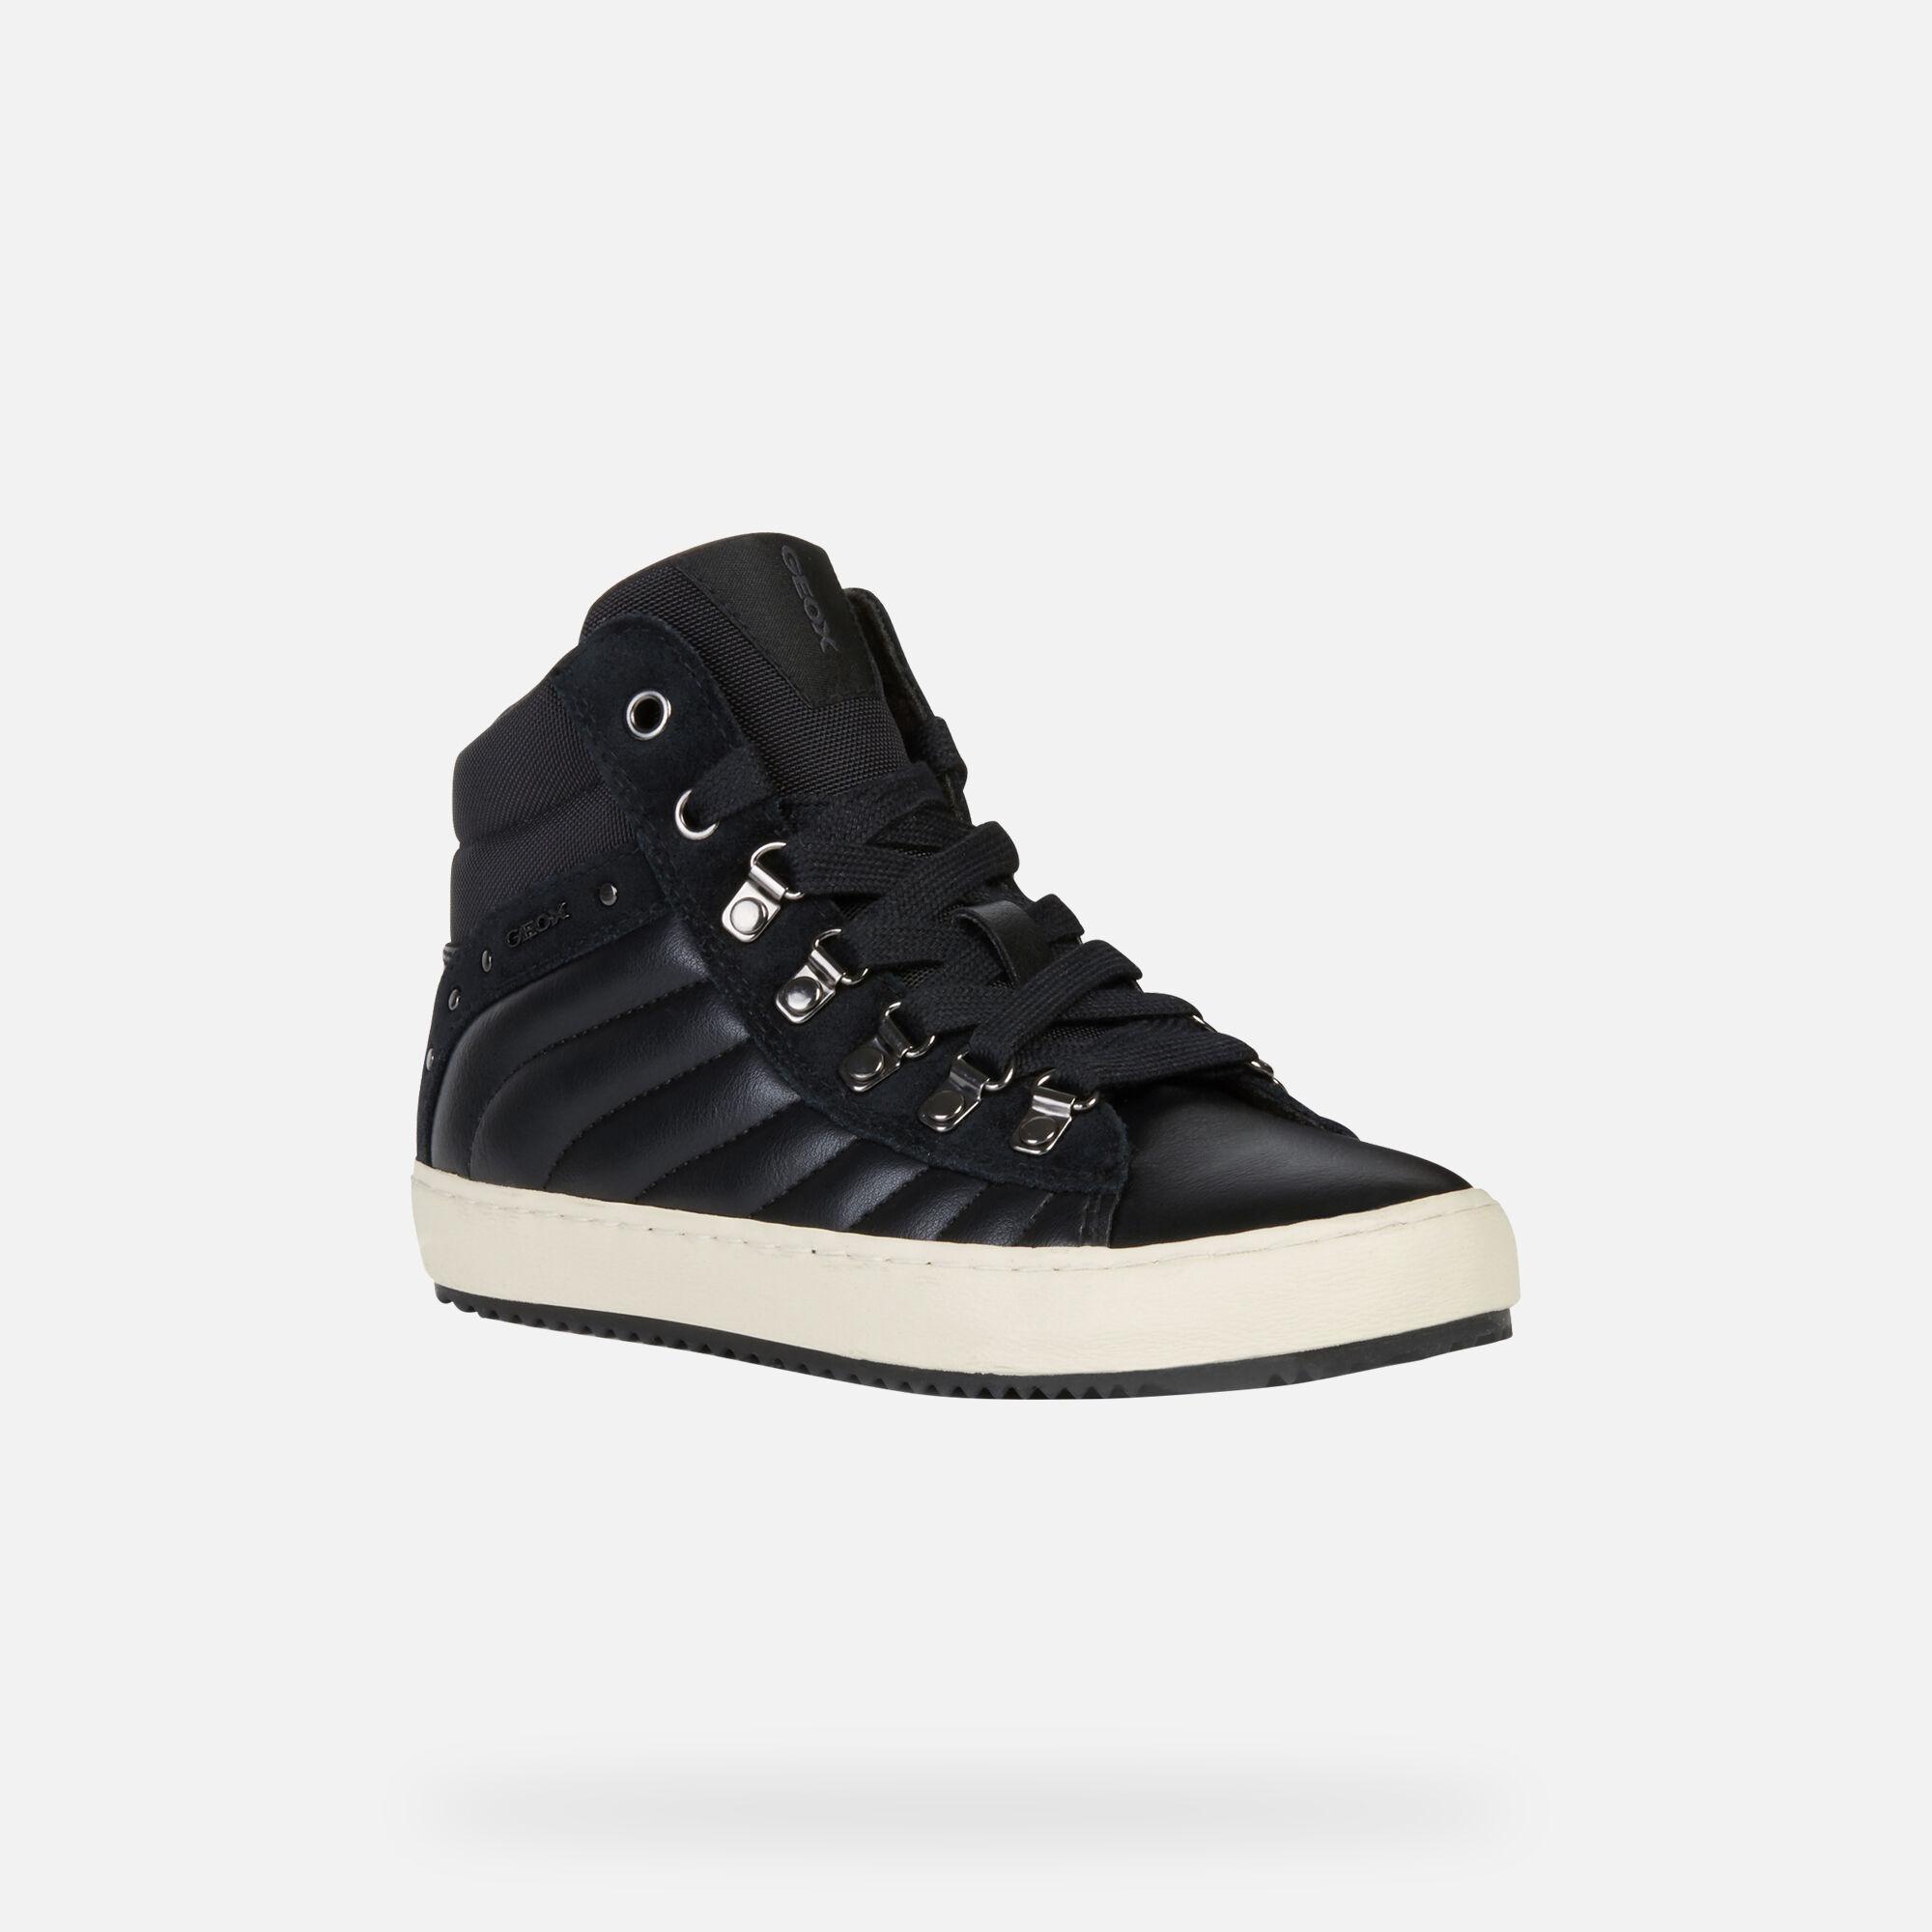 KALISPERA BIMBA Black | Sneakers Geox Bambina | FIOG